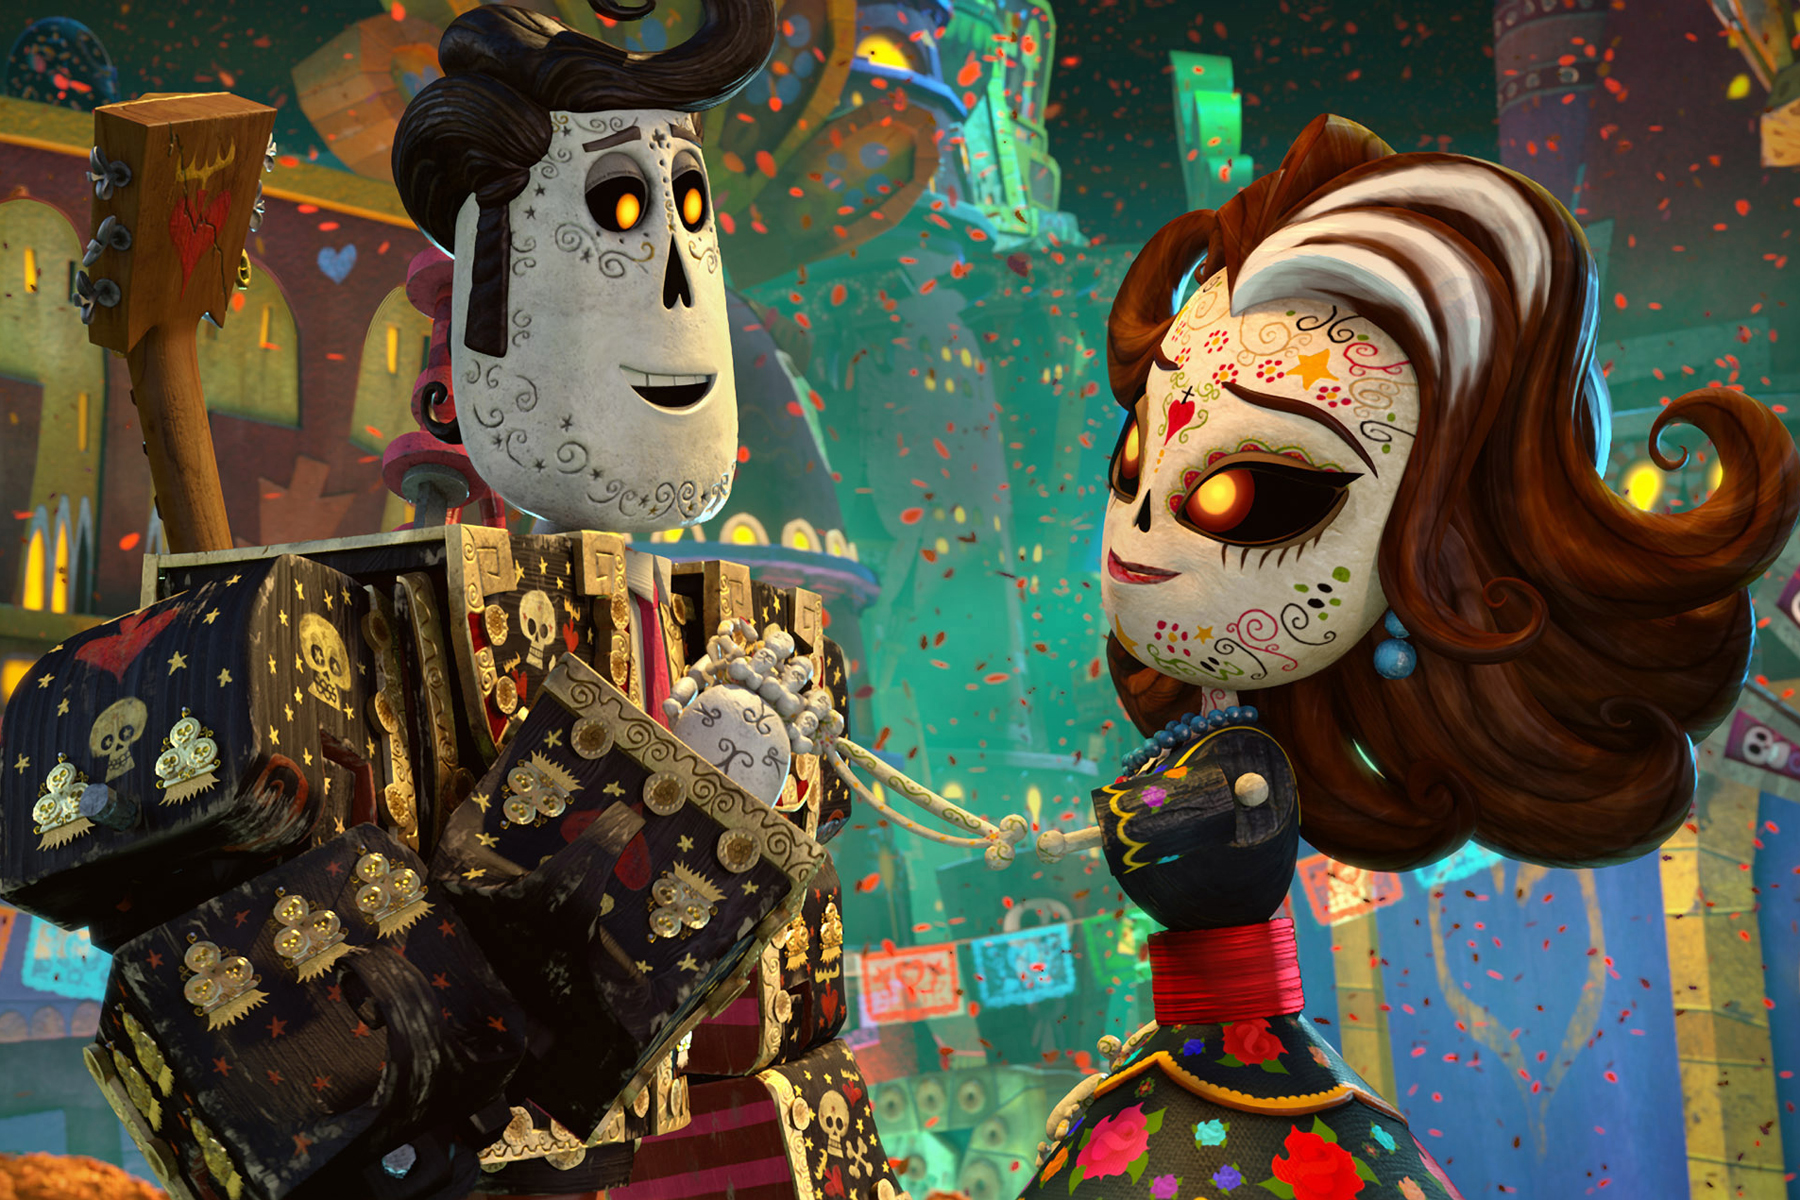 The Director of 'The Book of Life' Grew Up Thinking Skeletor Was a Dia de Muertos Superhero